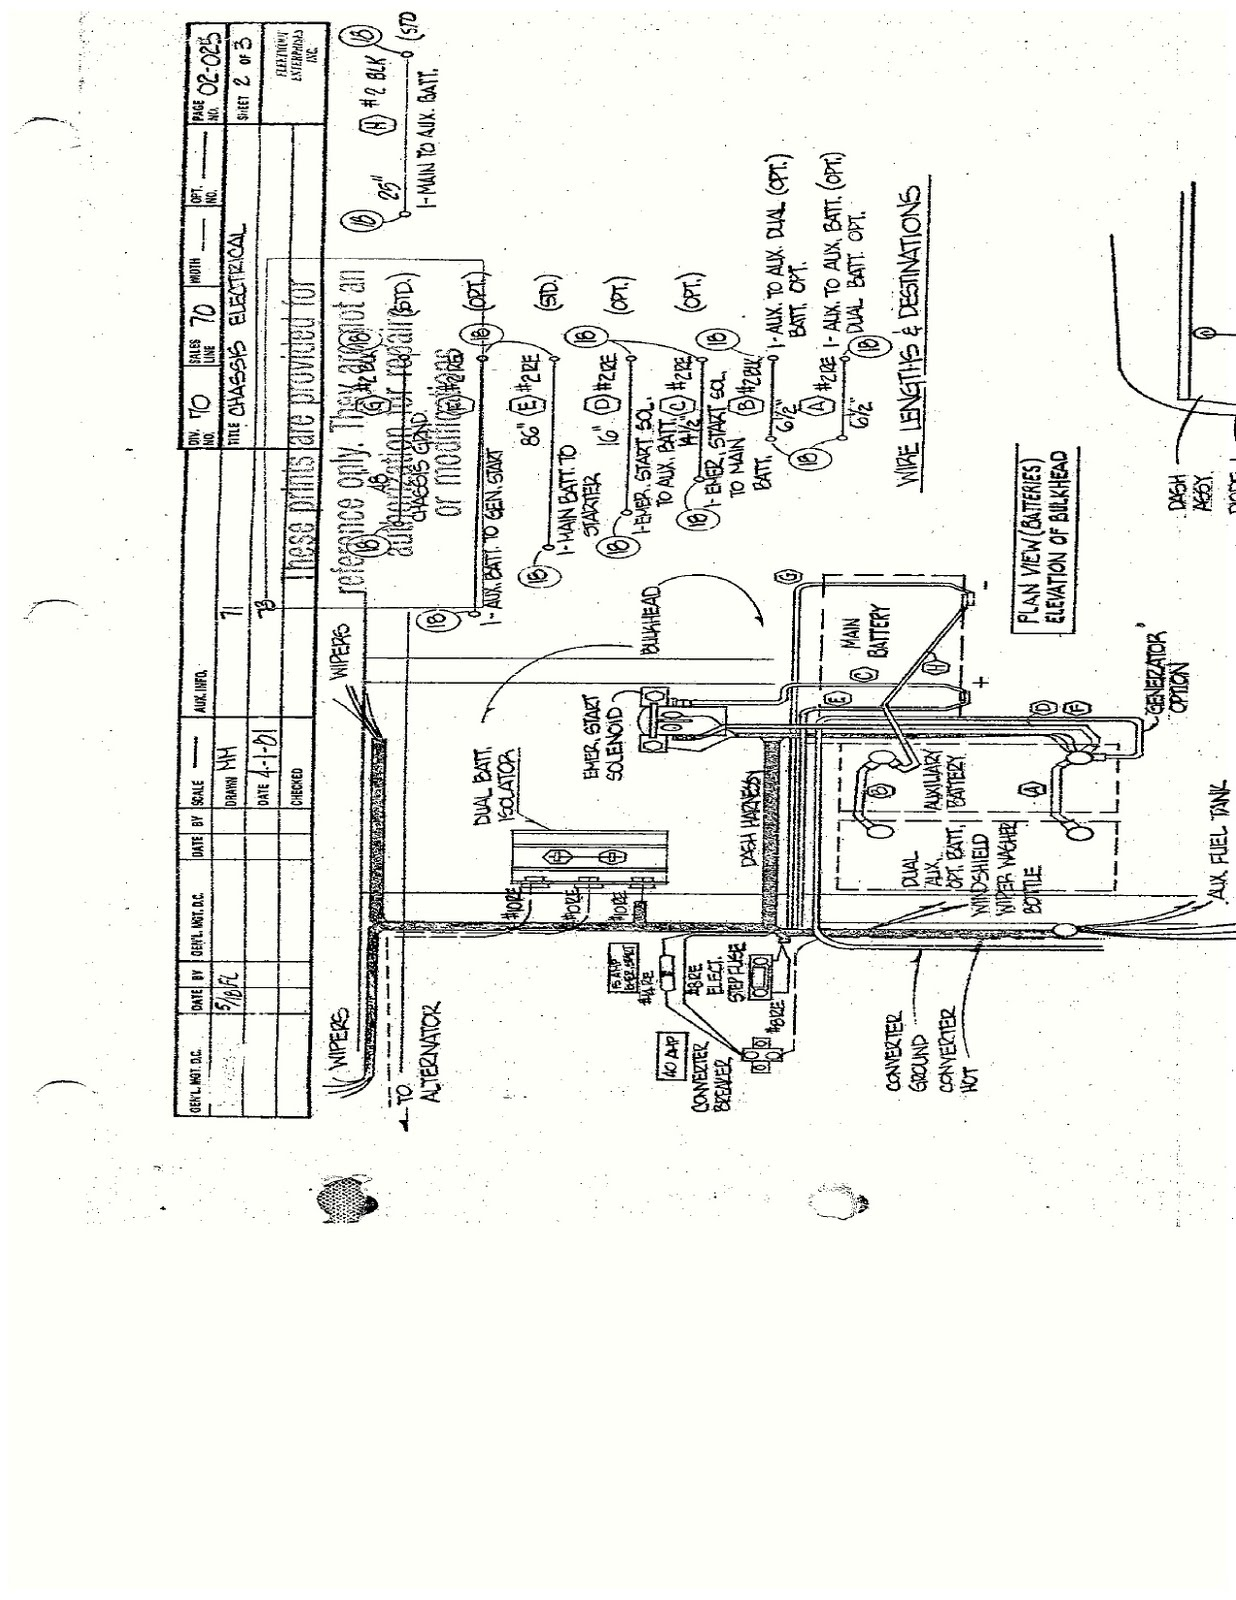 Diagram 1991 Pace Arrow Motorhome Battery Wiring Diagram Full Version Hd Quality Wiring Diagram Diagramer Siggy2000 De